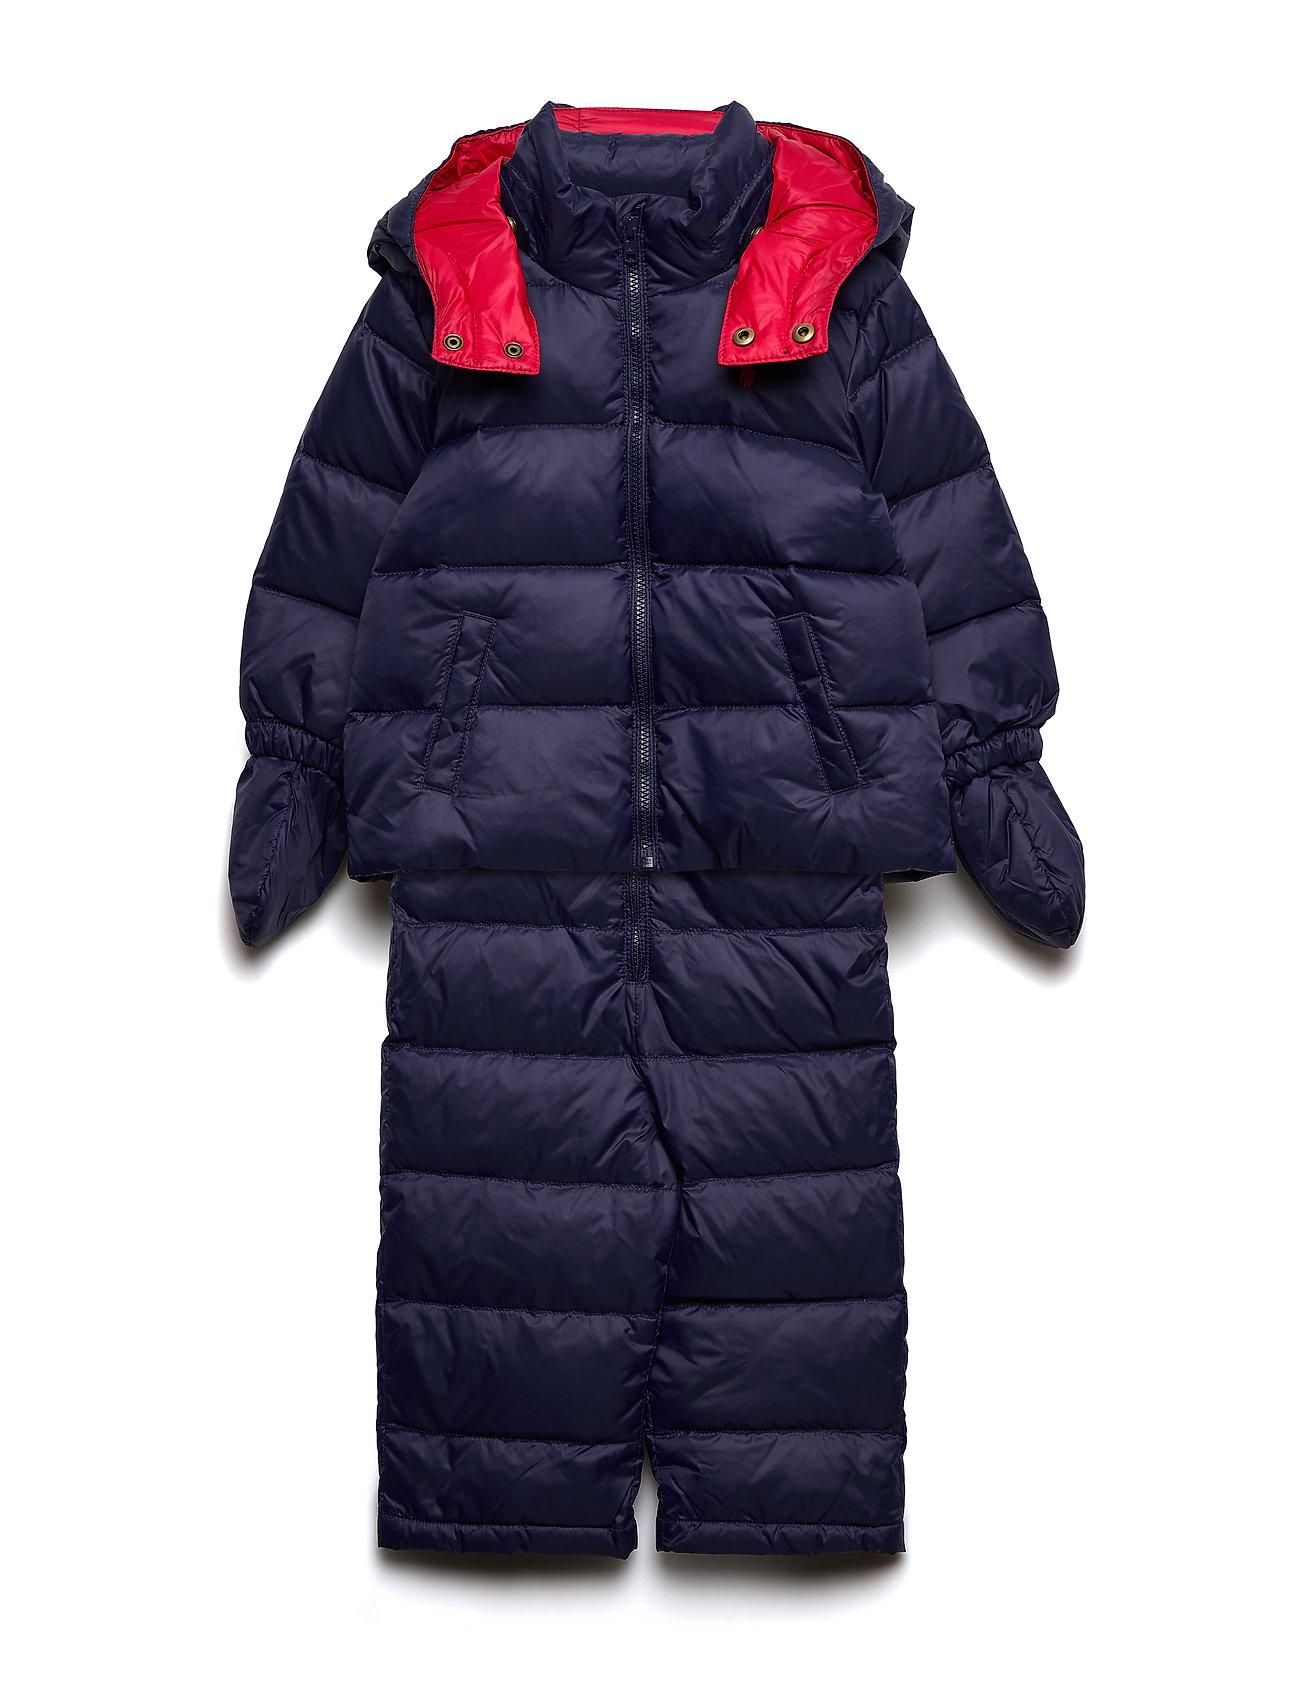 Ralph Lauren Baby SNOWSUIT-OUTERWEAR-BUNTING - FRENCH NAVY